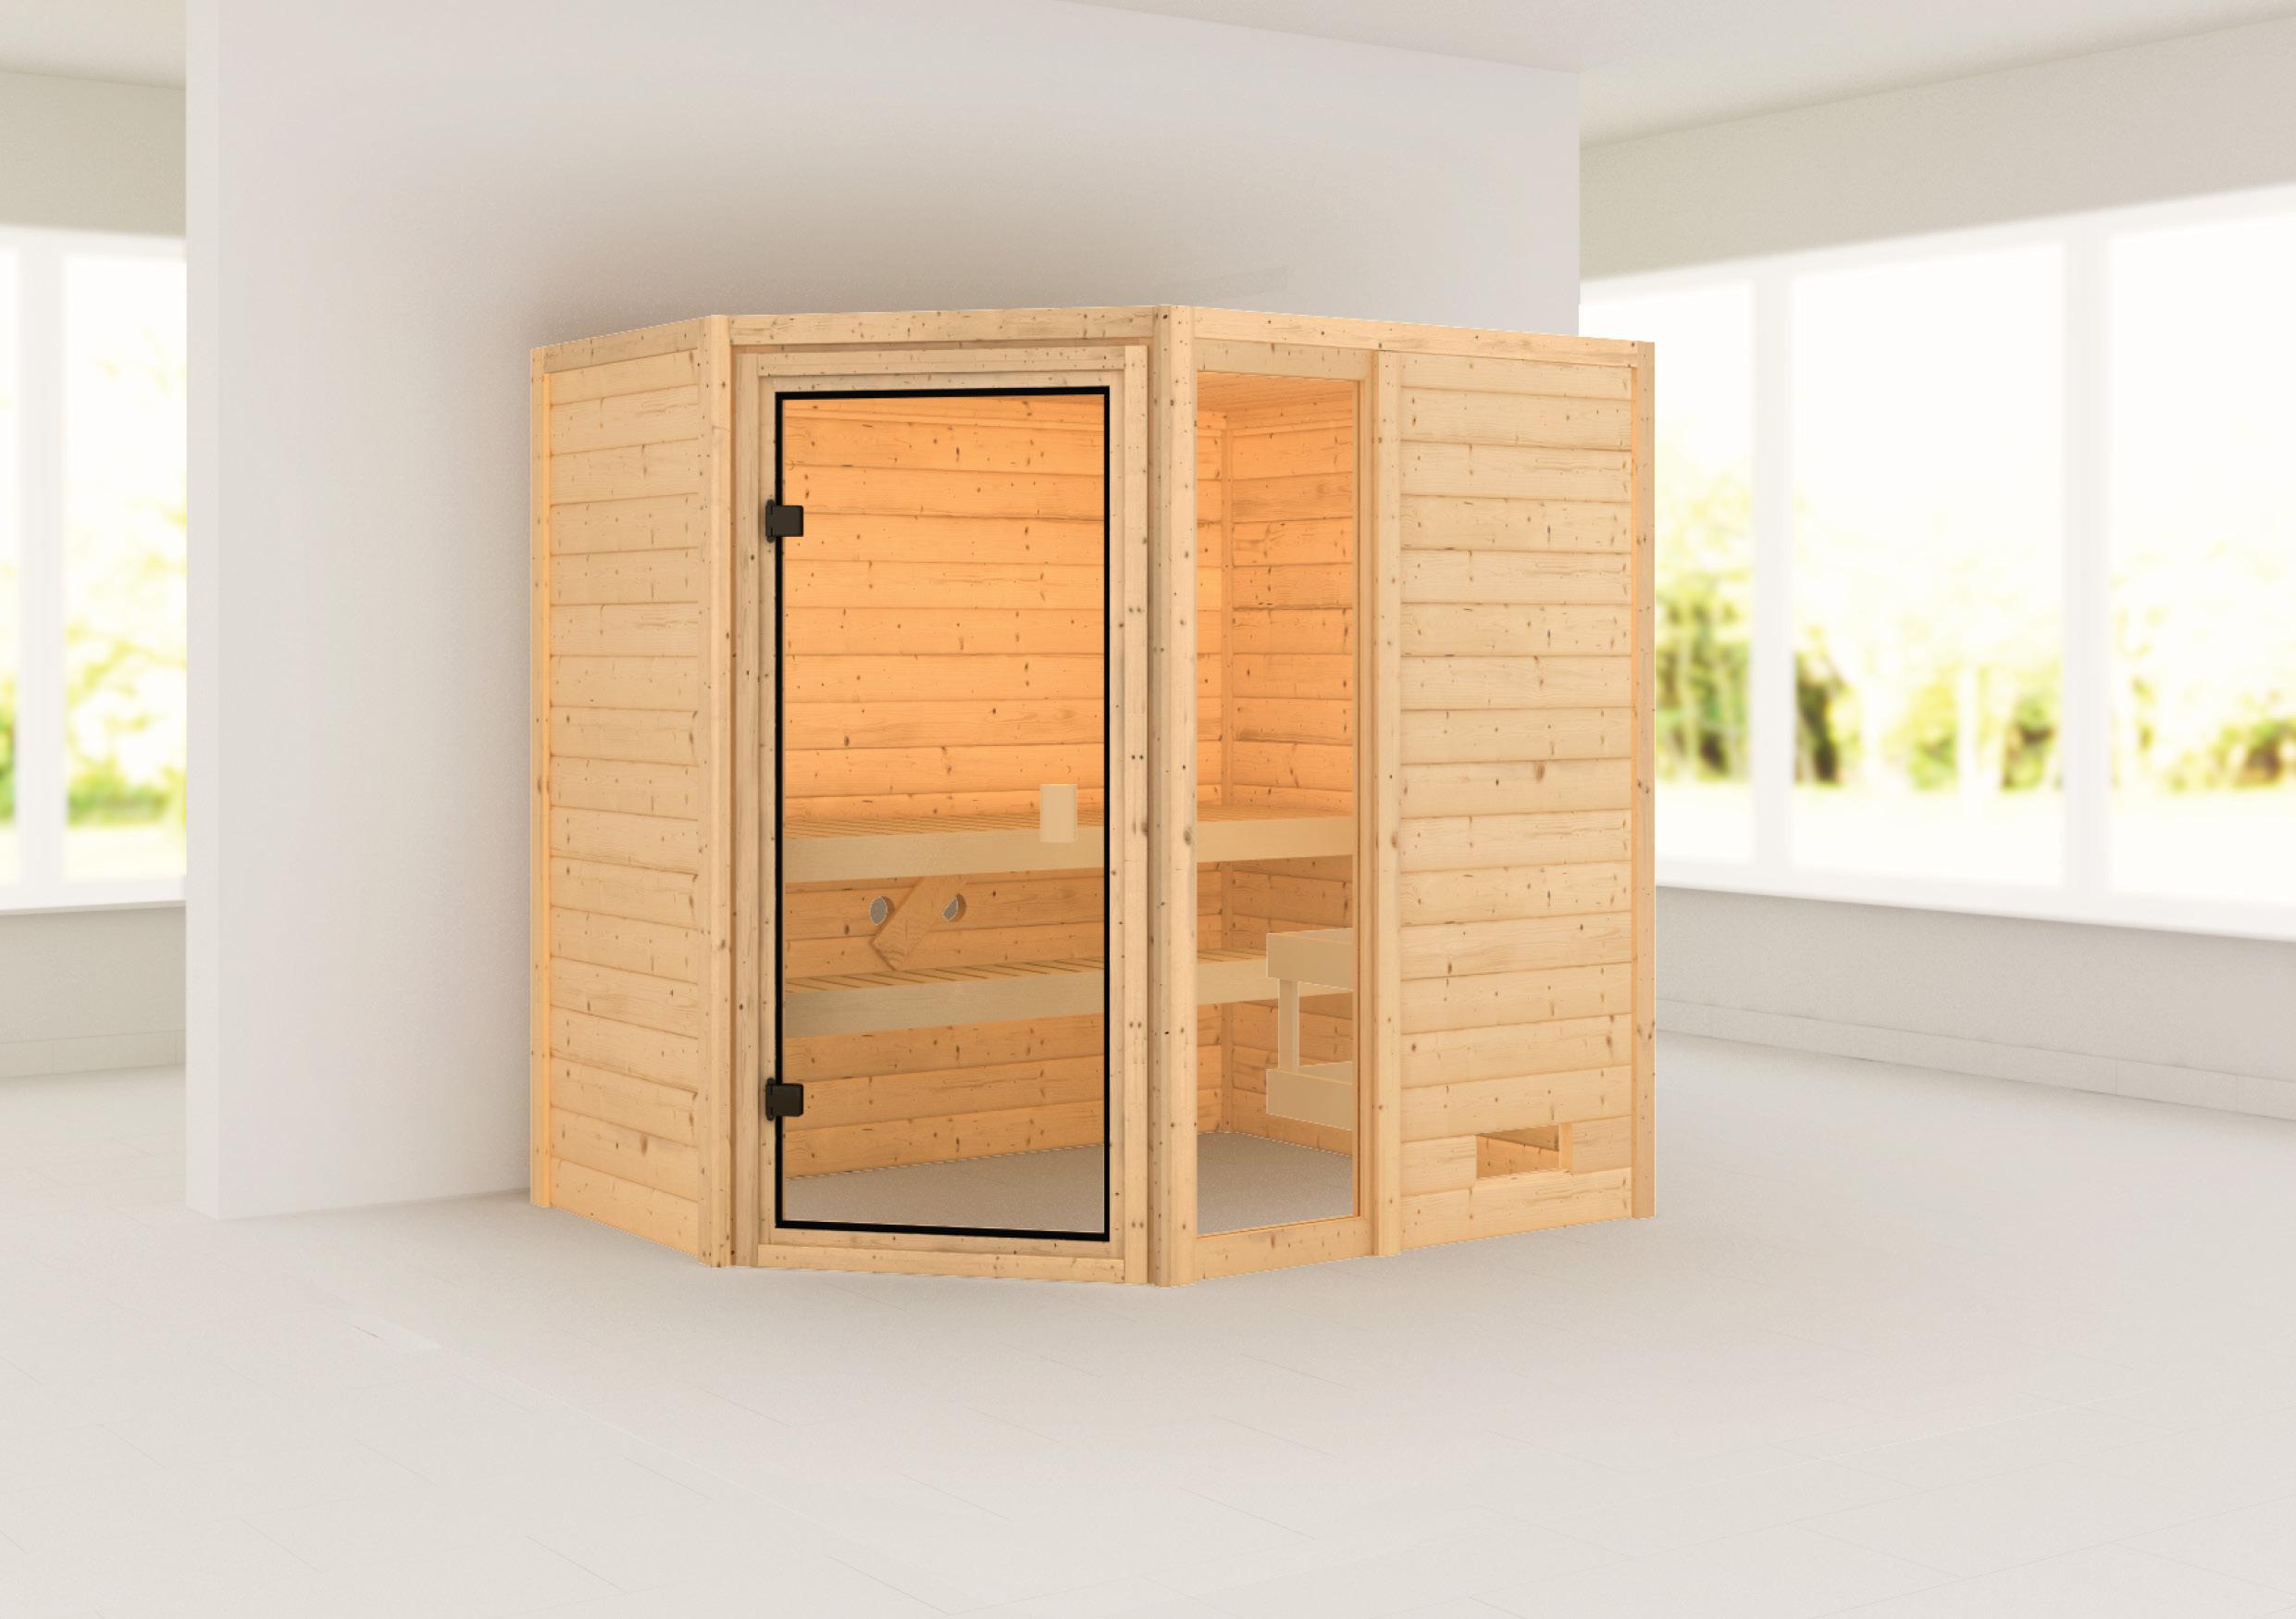 Woodfeeling Sauna Jada 38mm ohne Saunaofen Bild 1